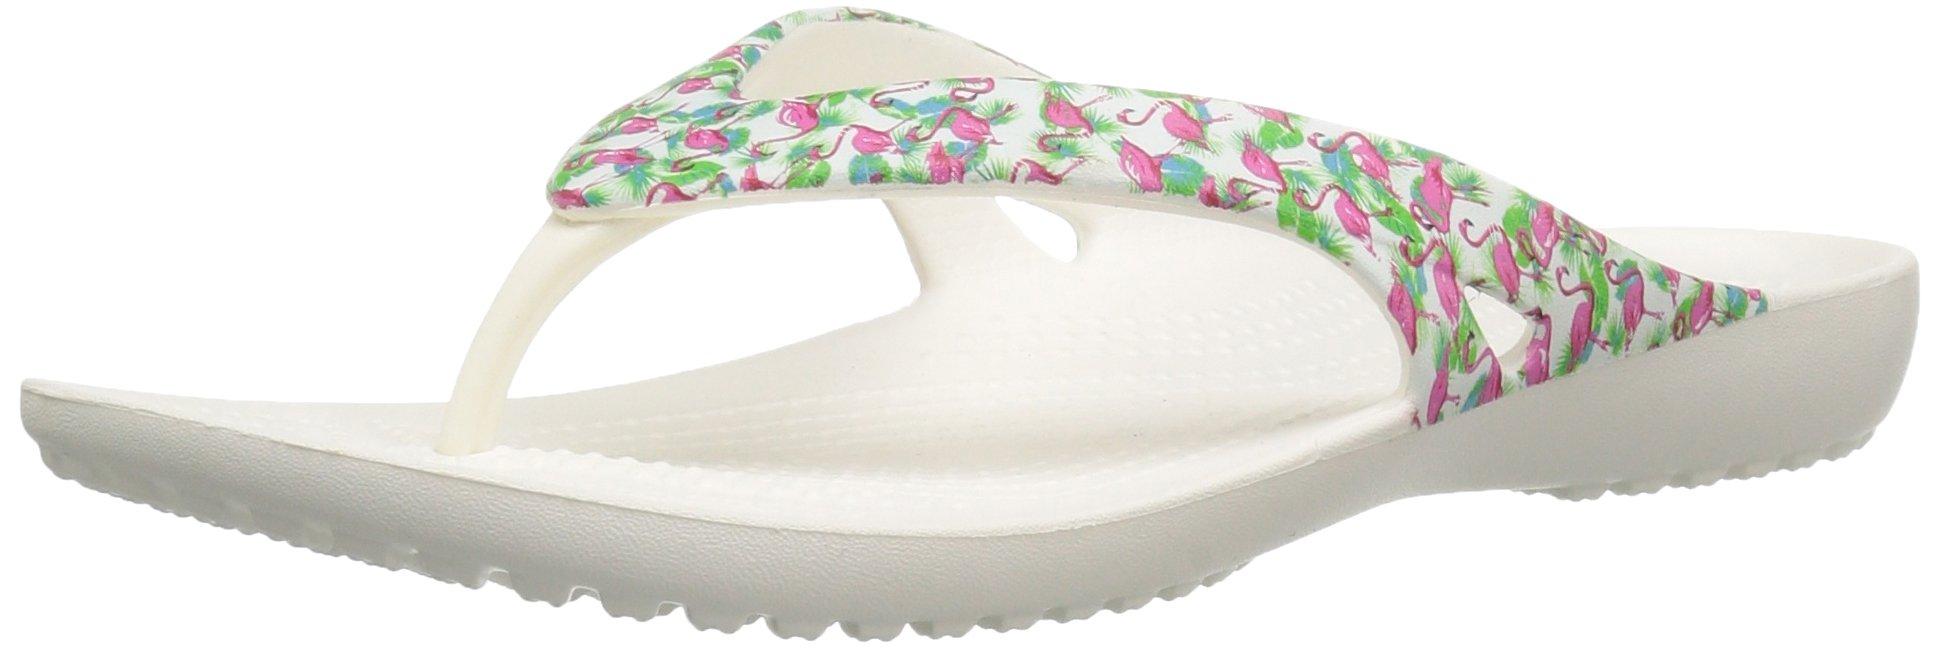 Crocs Women's Kadee Ii Graphic W Flip Flop, Flamingo, 7 M US